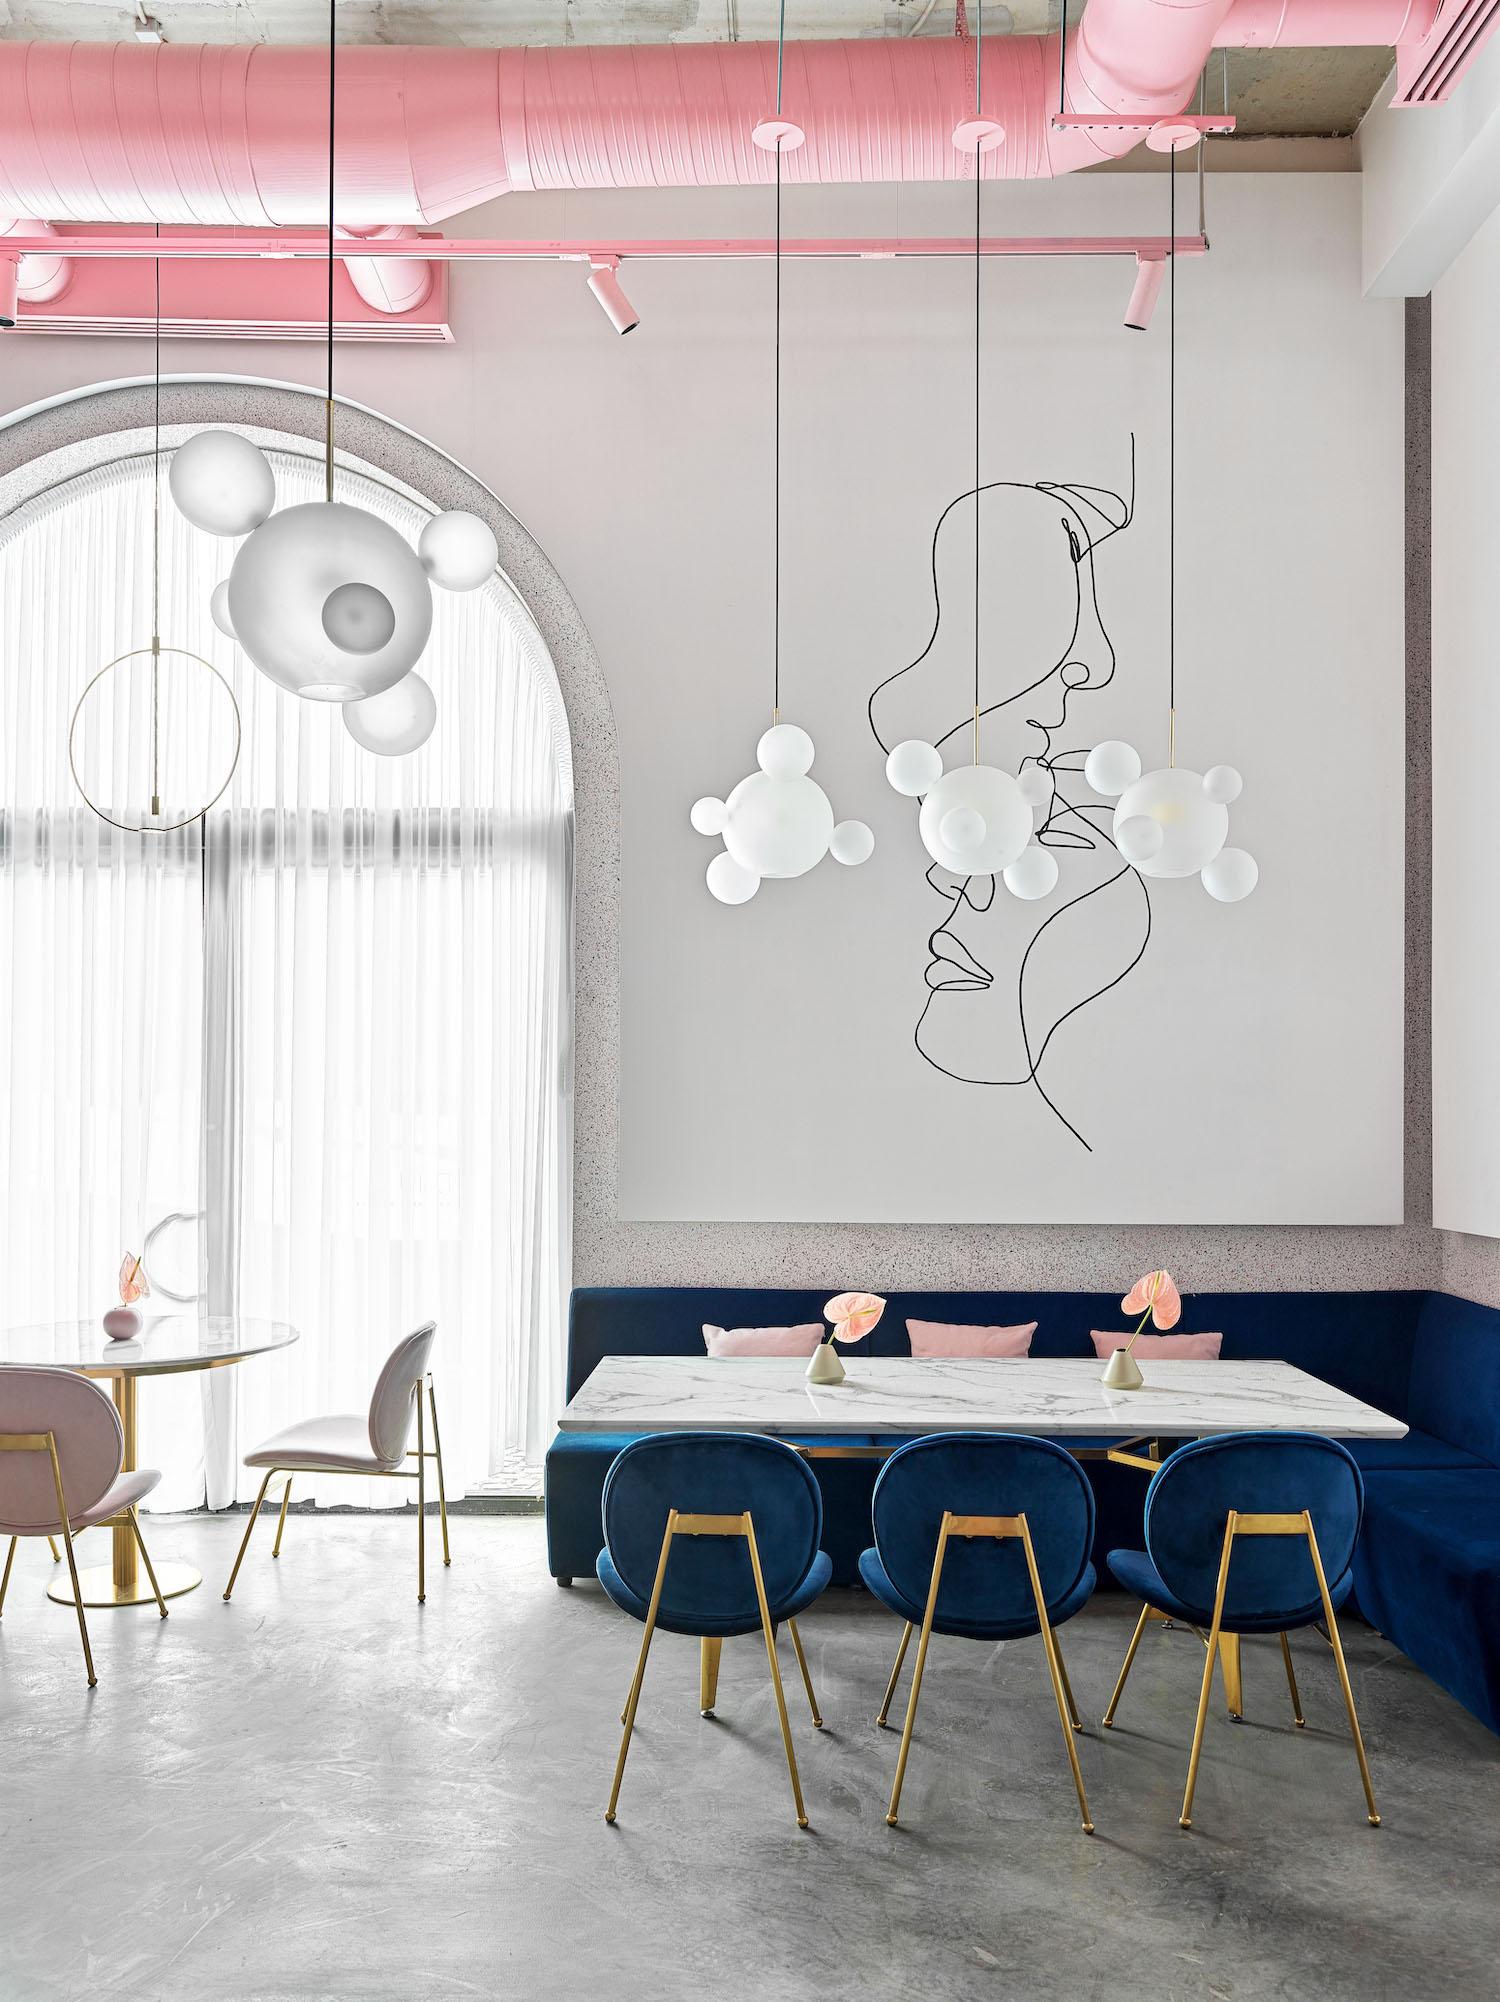 pendant lamp in restaurant hanged over table